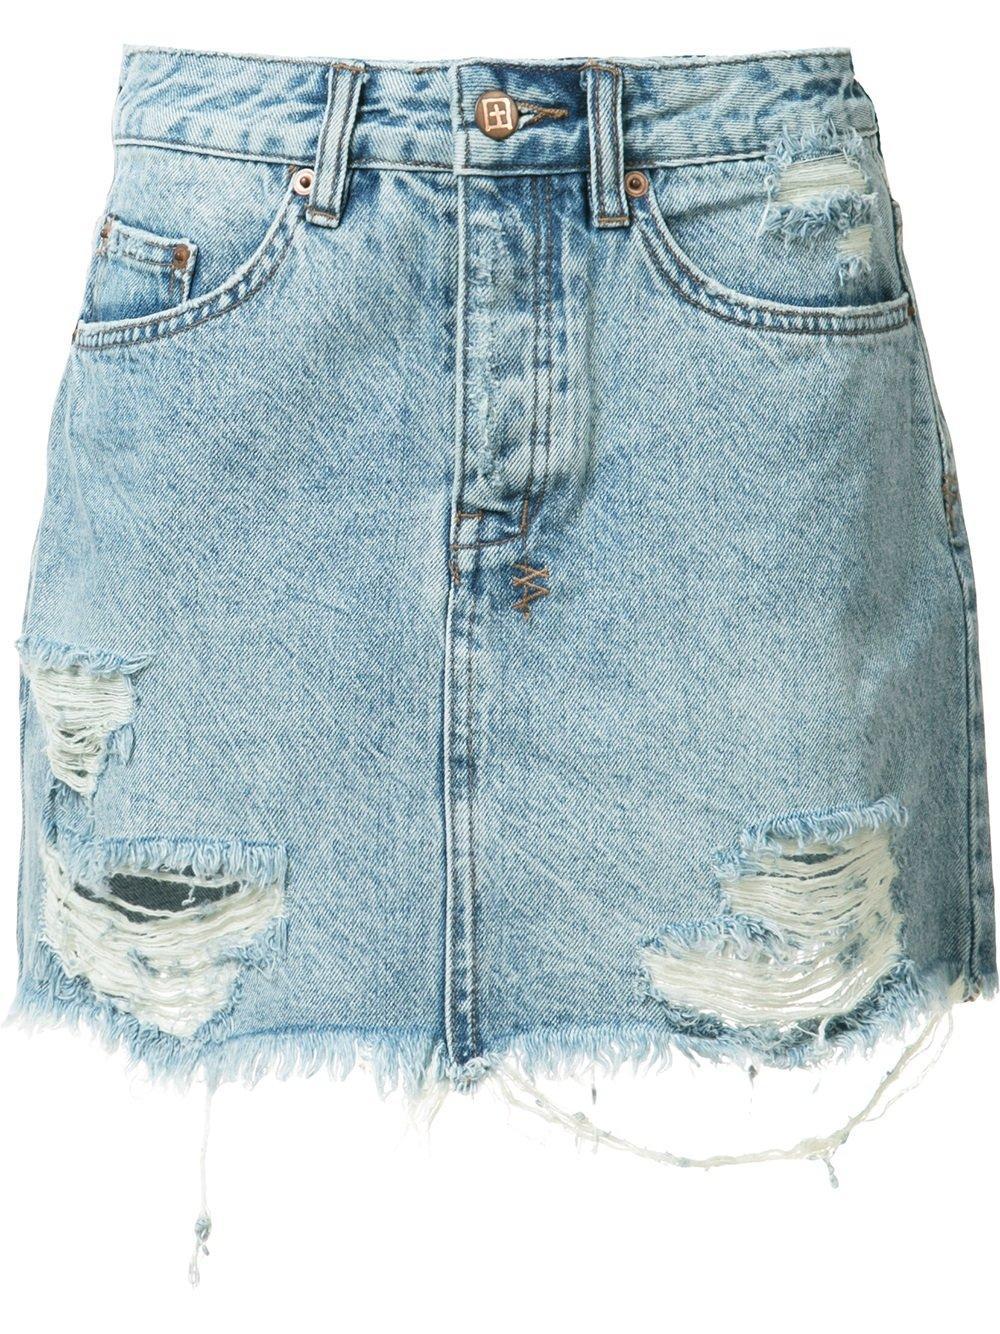 d5c44d9ab3a61 [28% OFF] [HOT] 2019 Ripped Denim Skirt In BLUE | ZAFUL